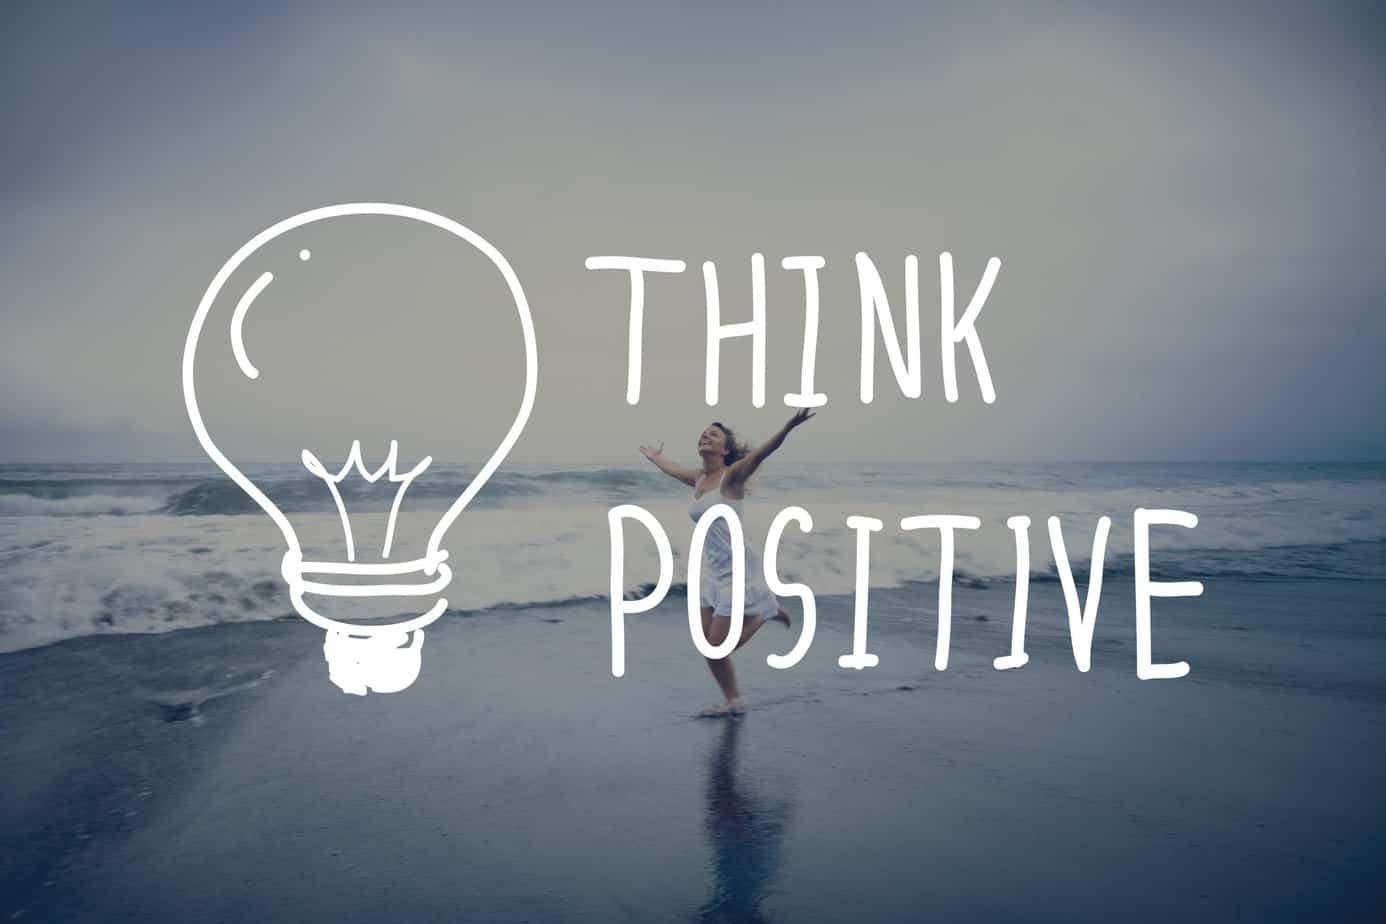 Postive Thinking